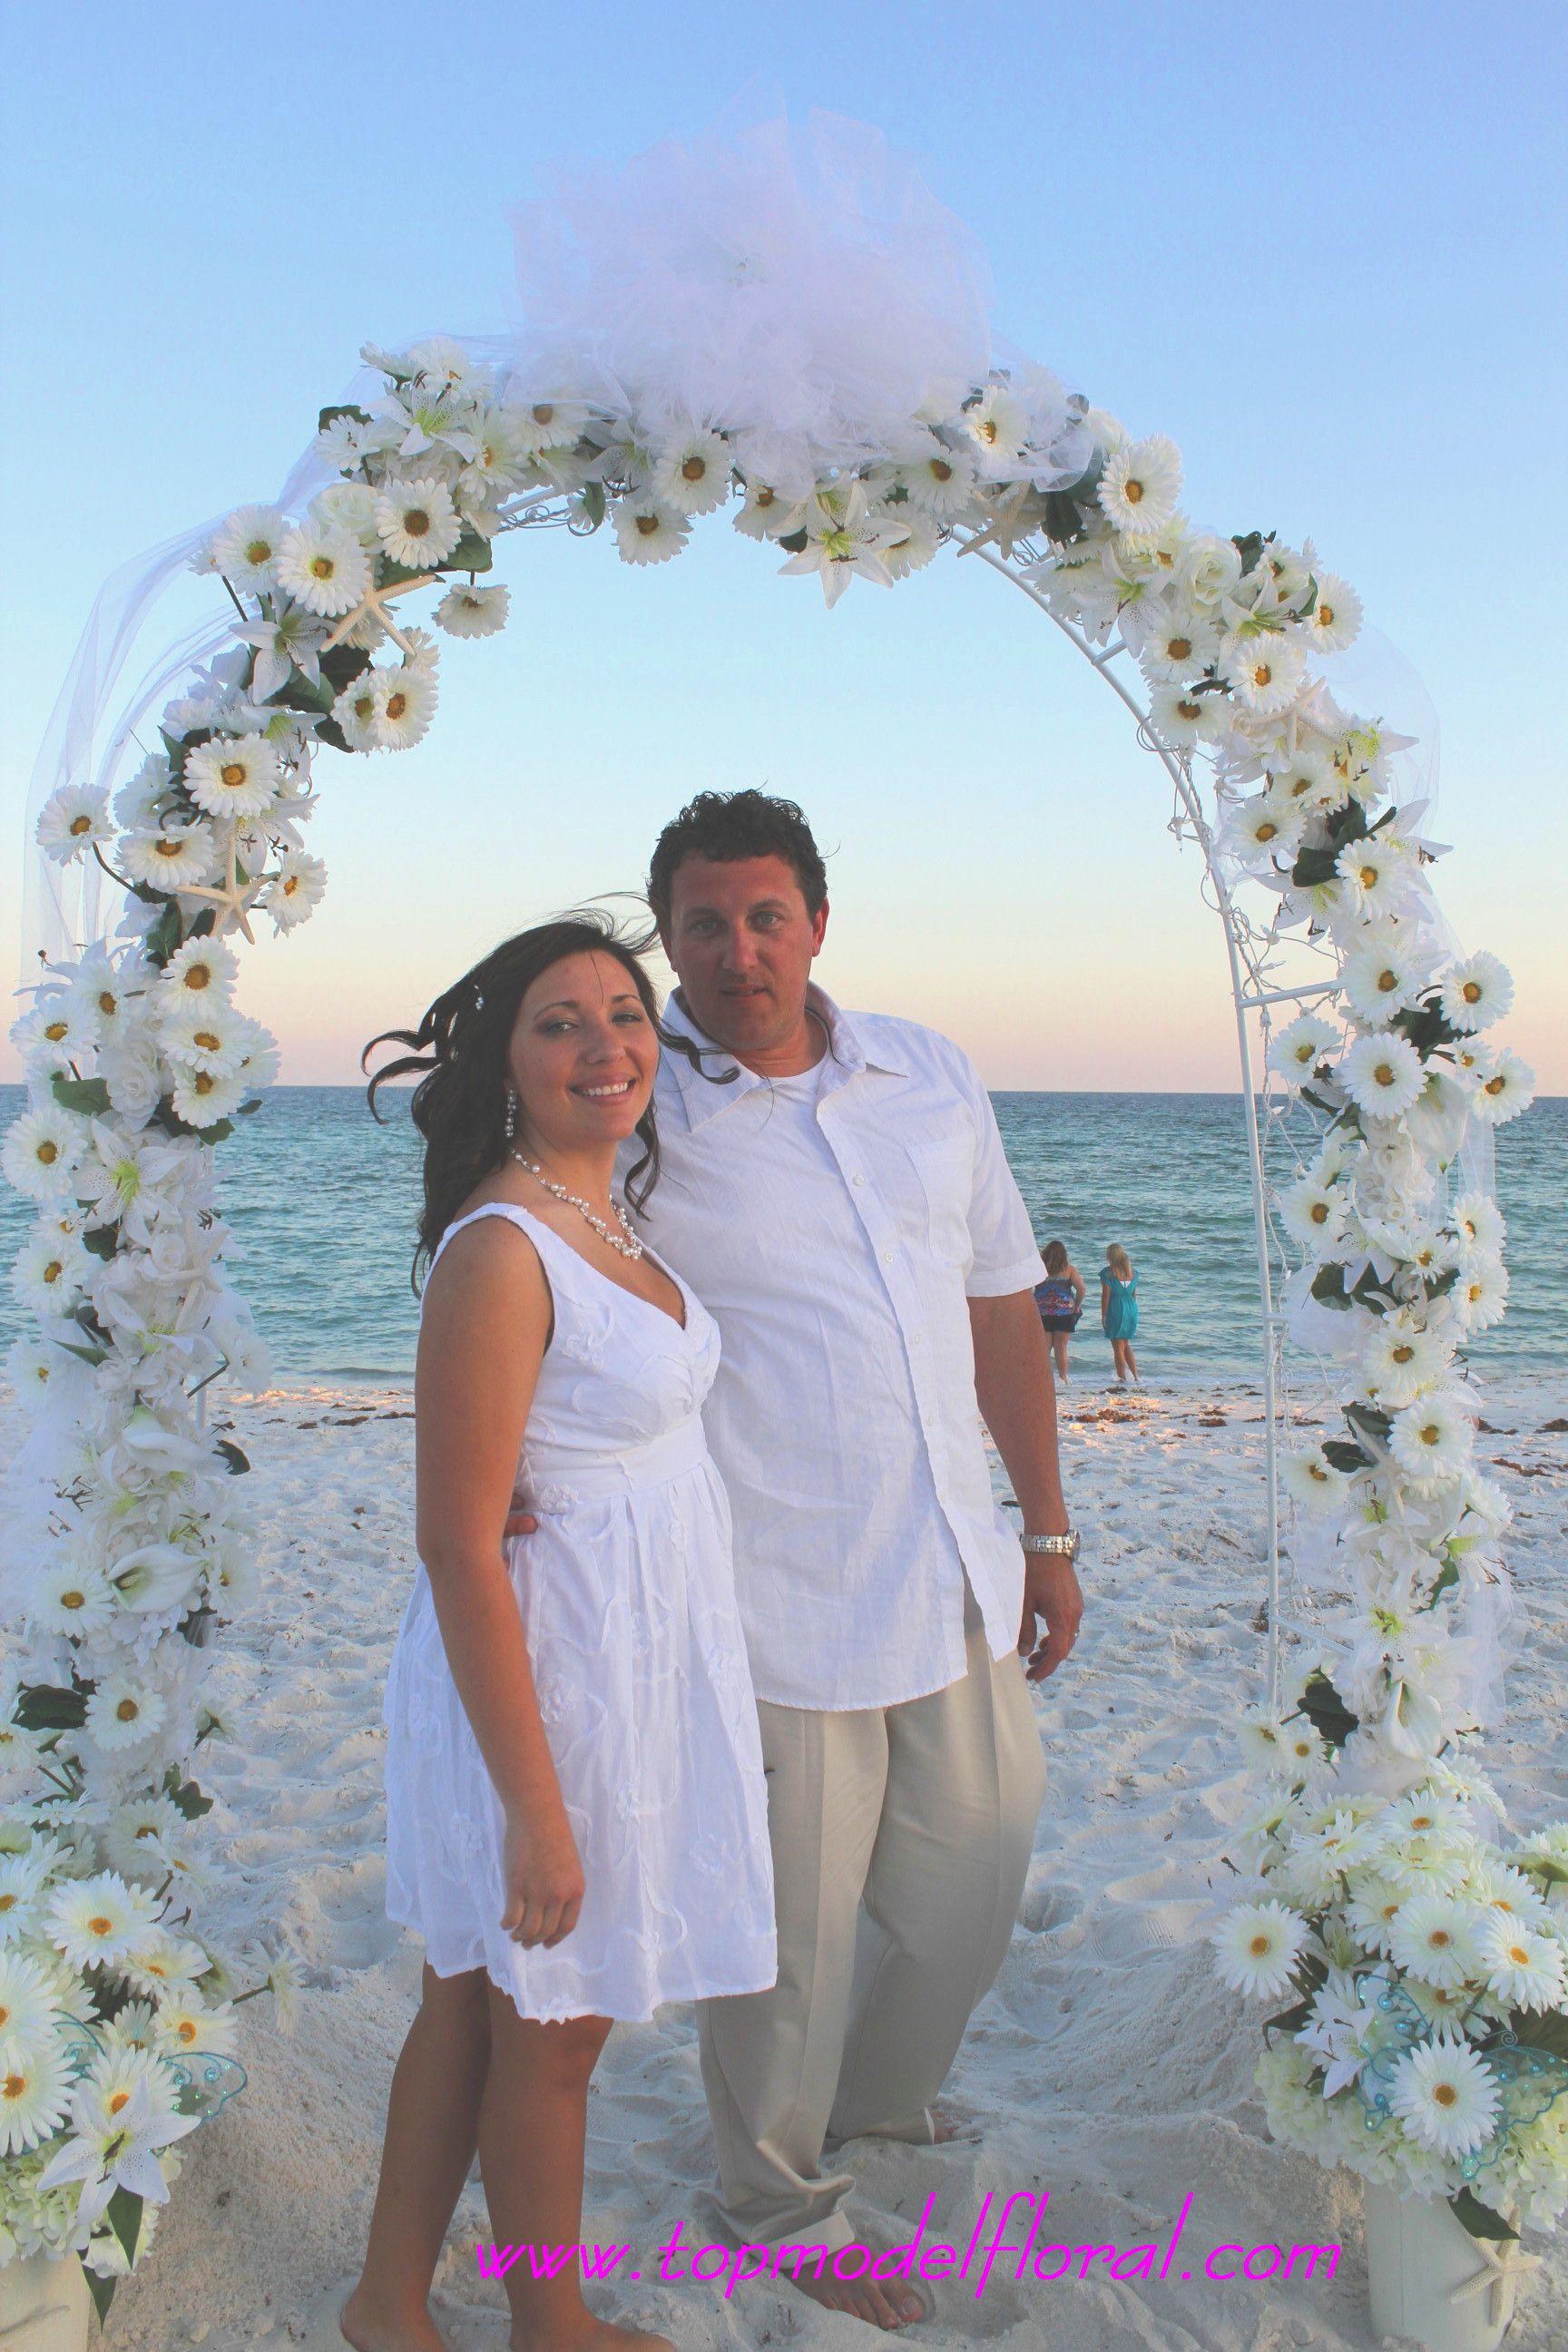 Beach wedding arch ideas google search wedding pinterest beach wedding arch ideas google search solutioingenieria Images